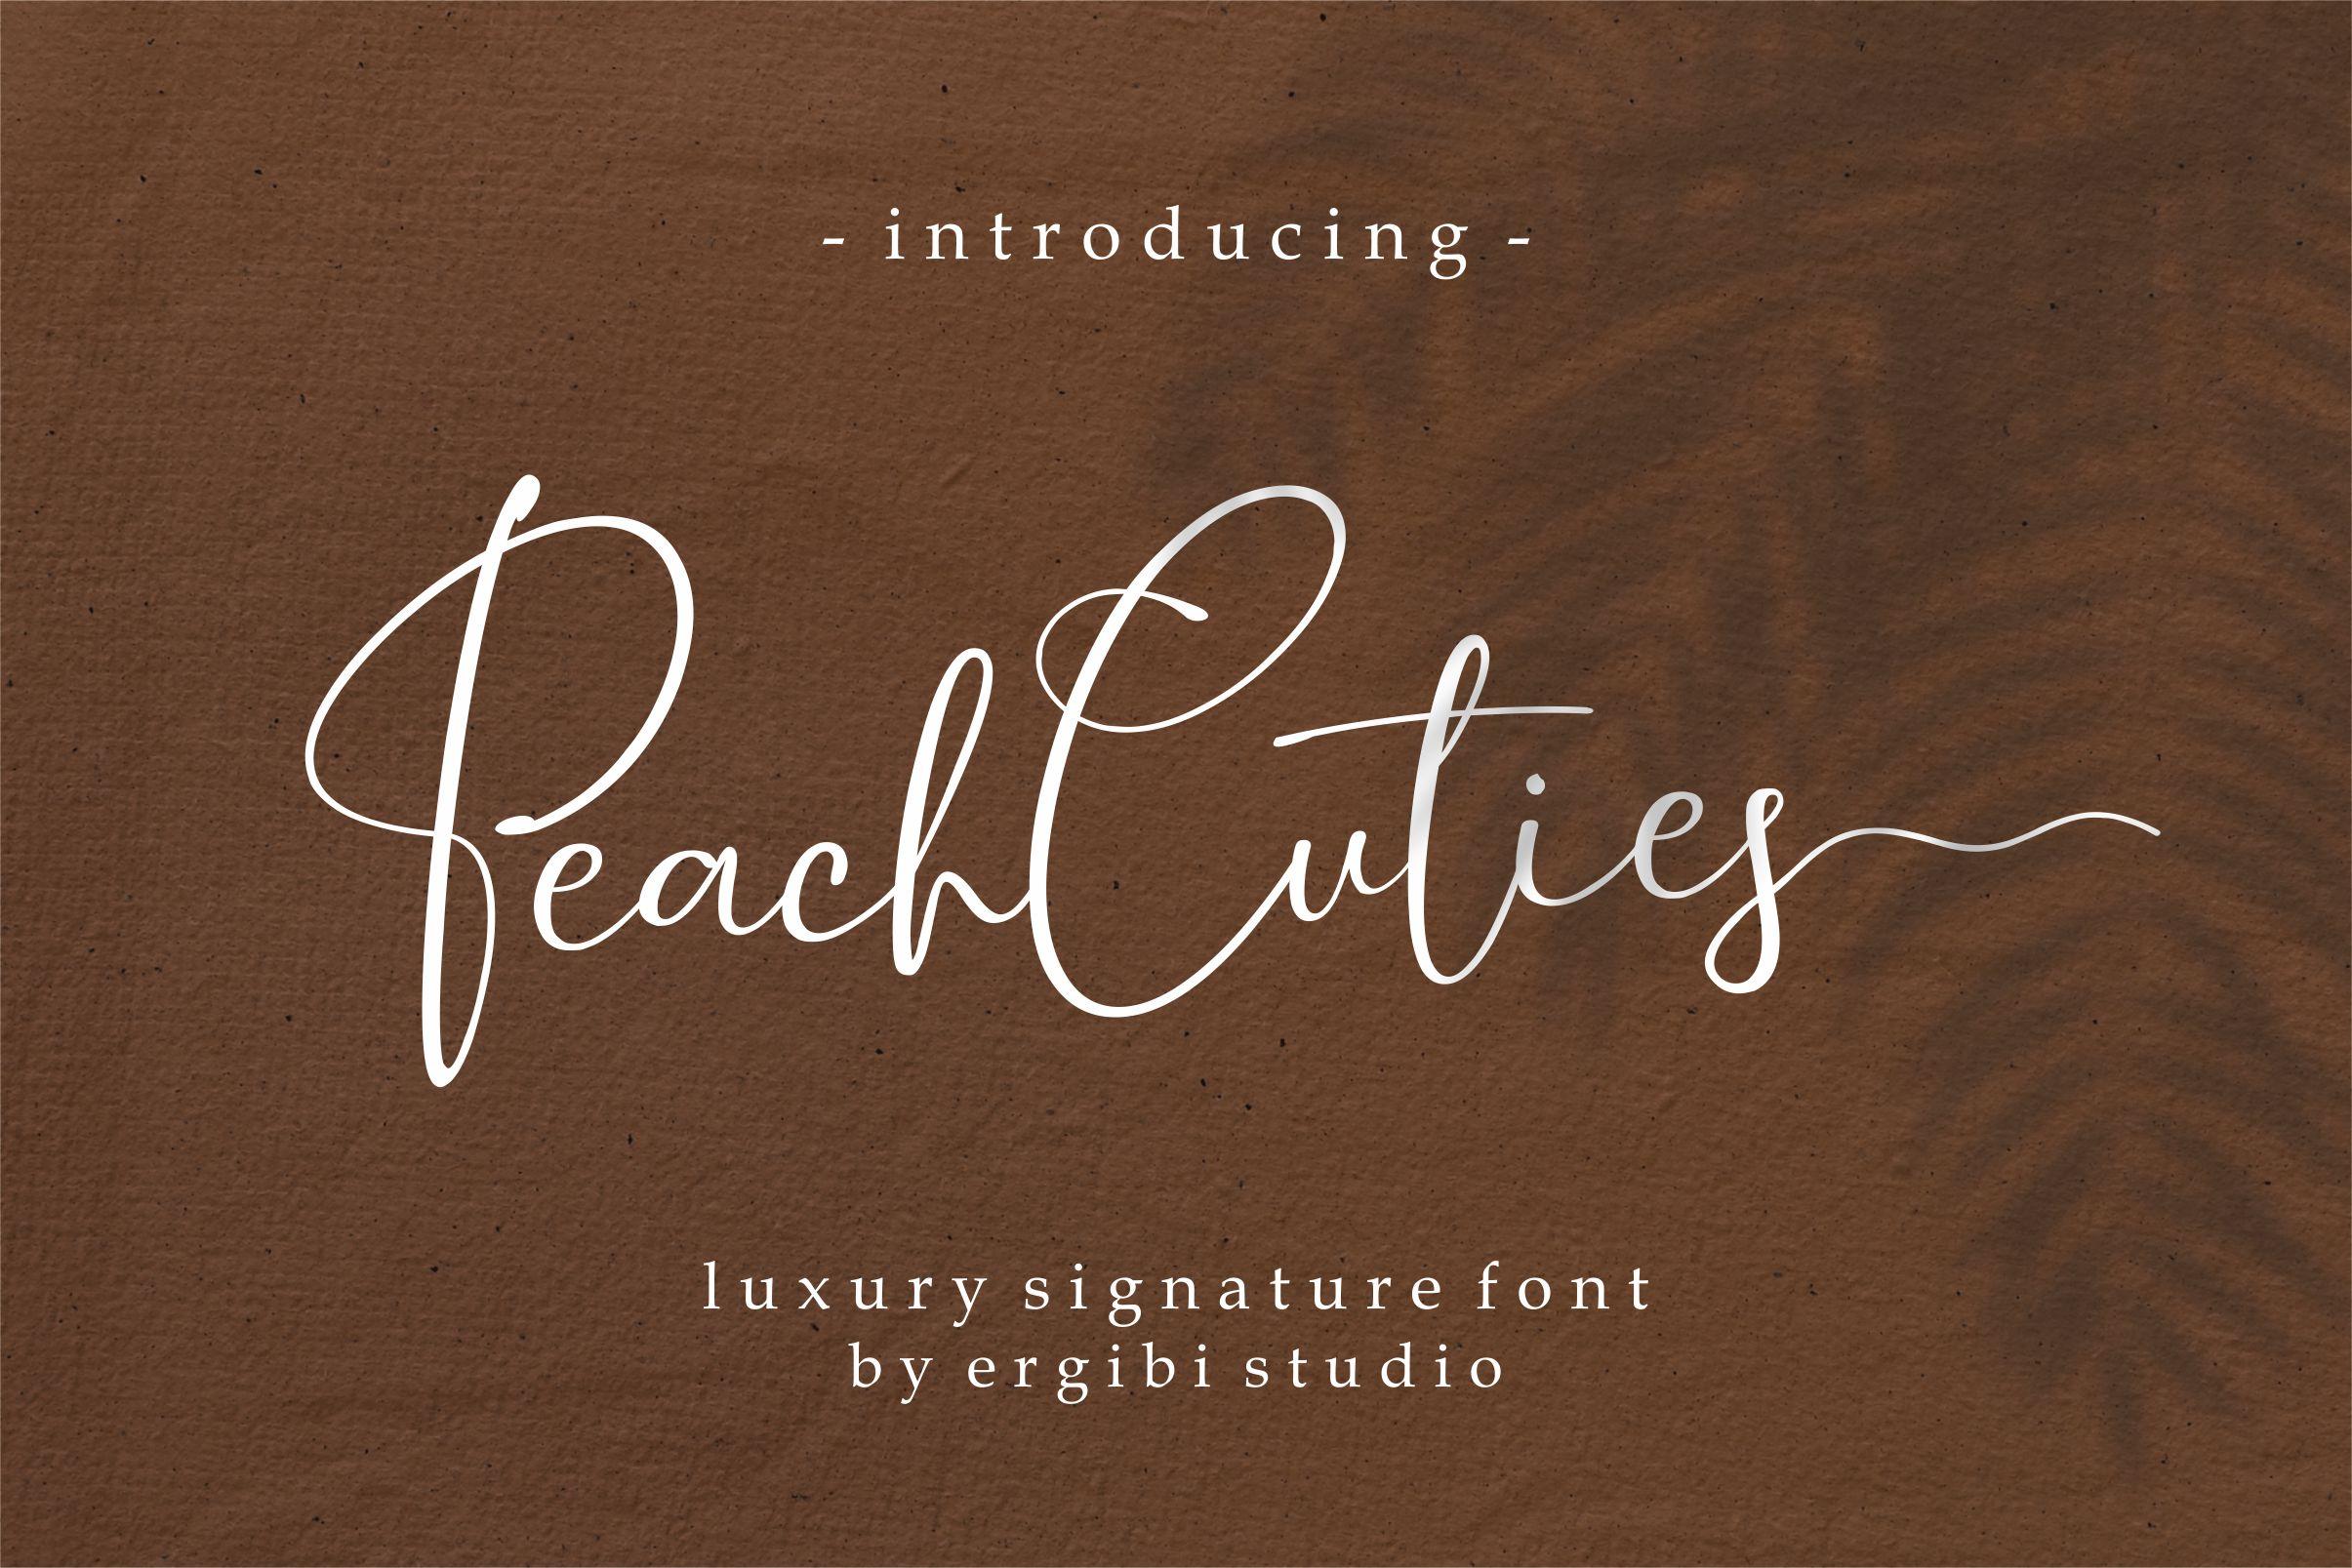 PeachCuties